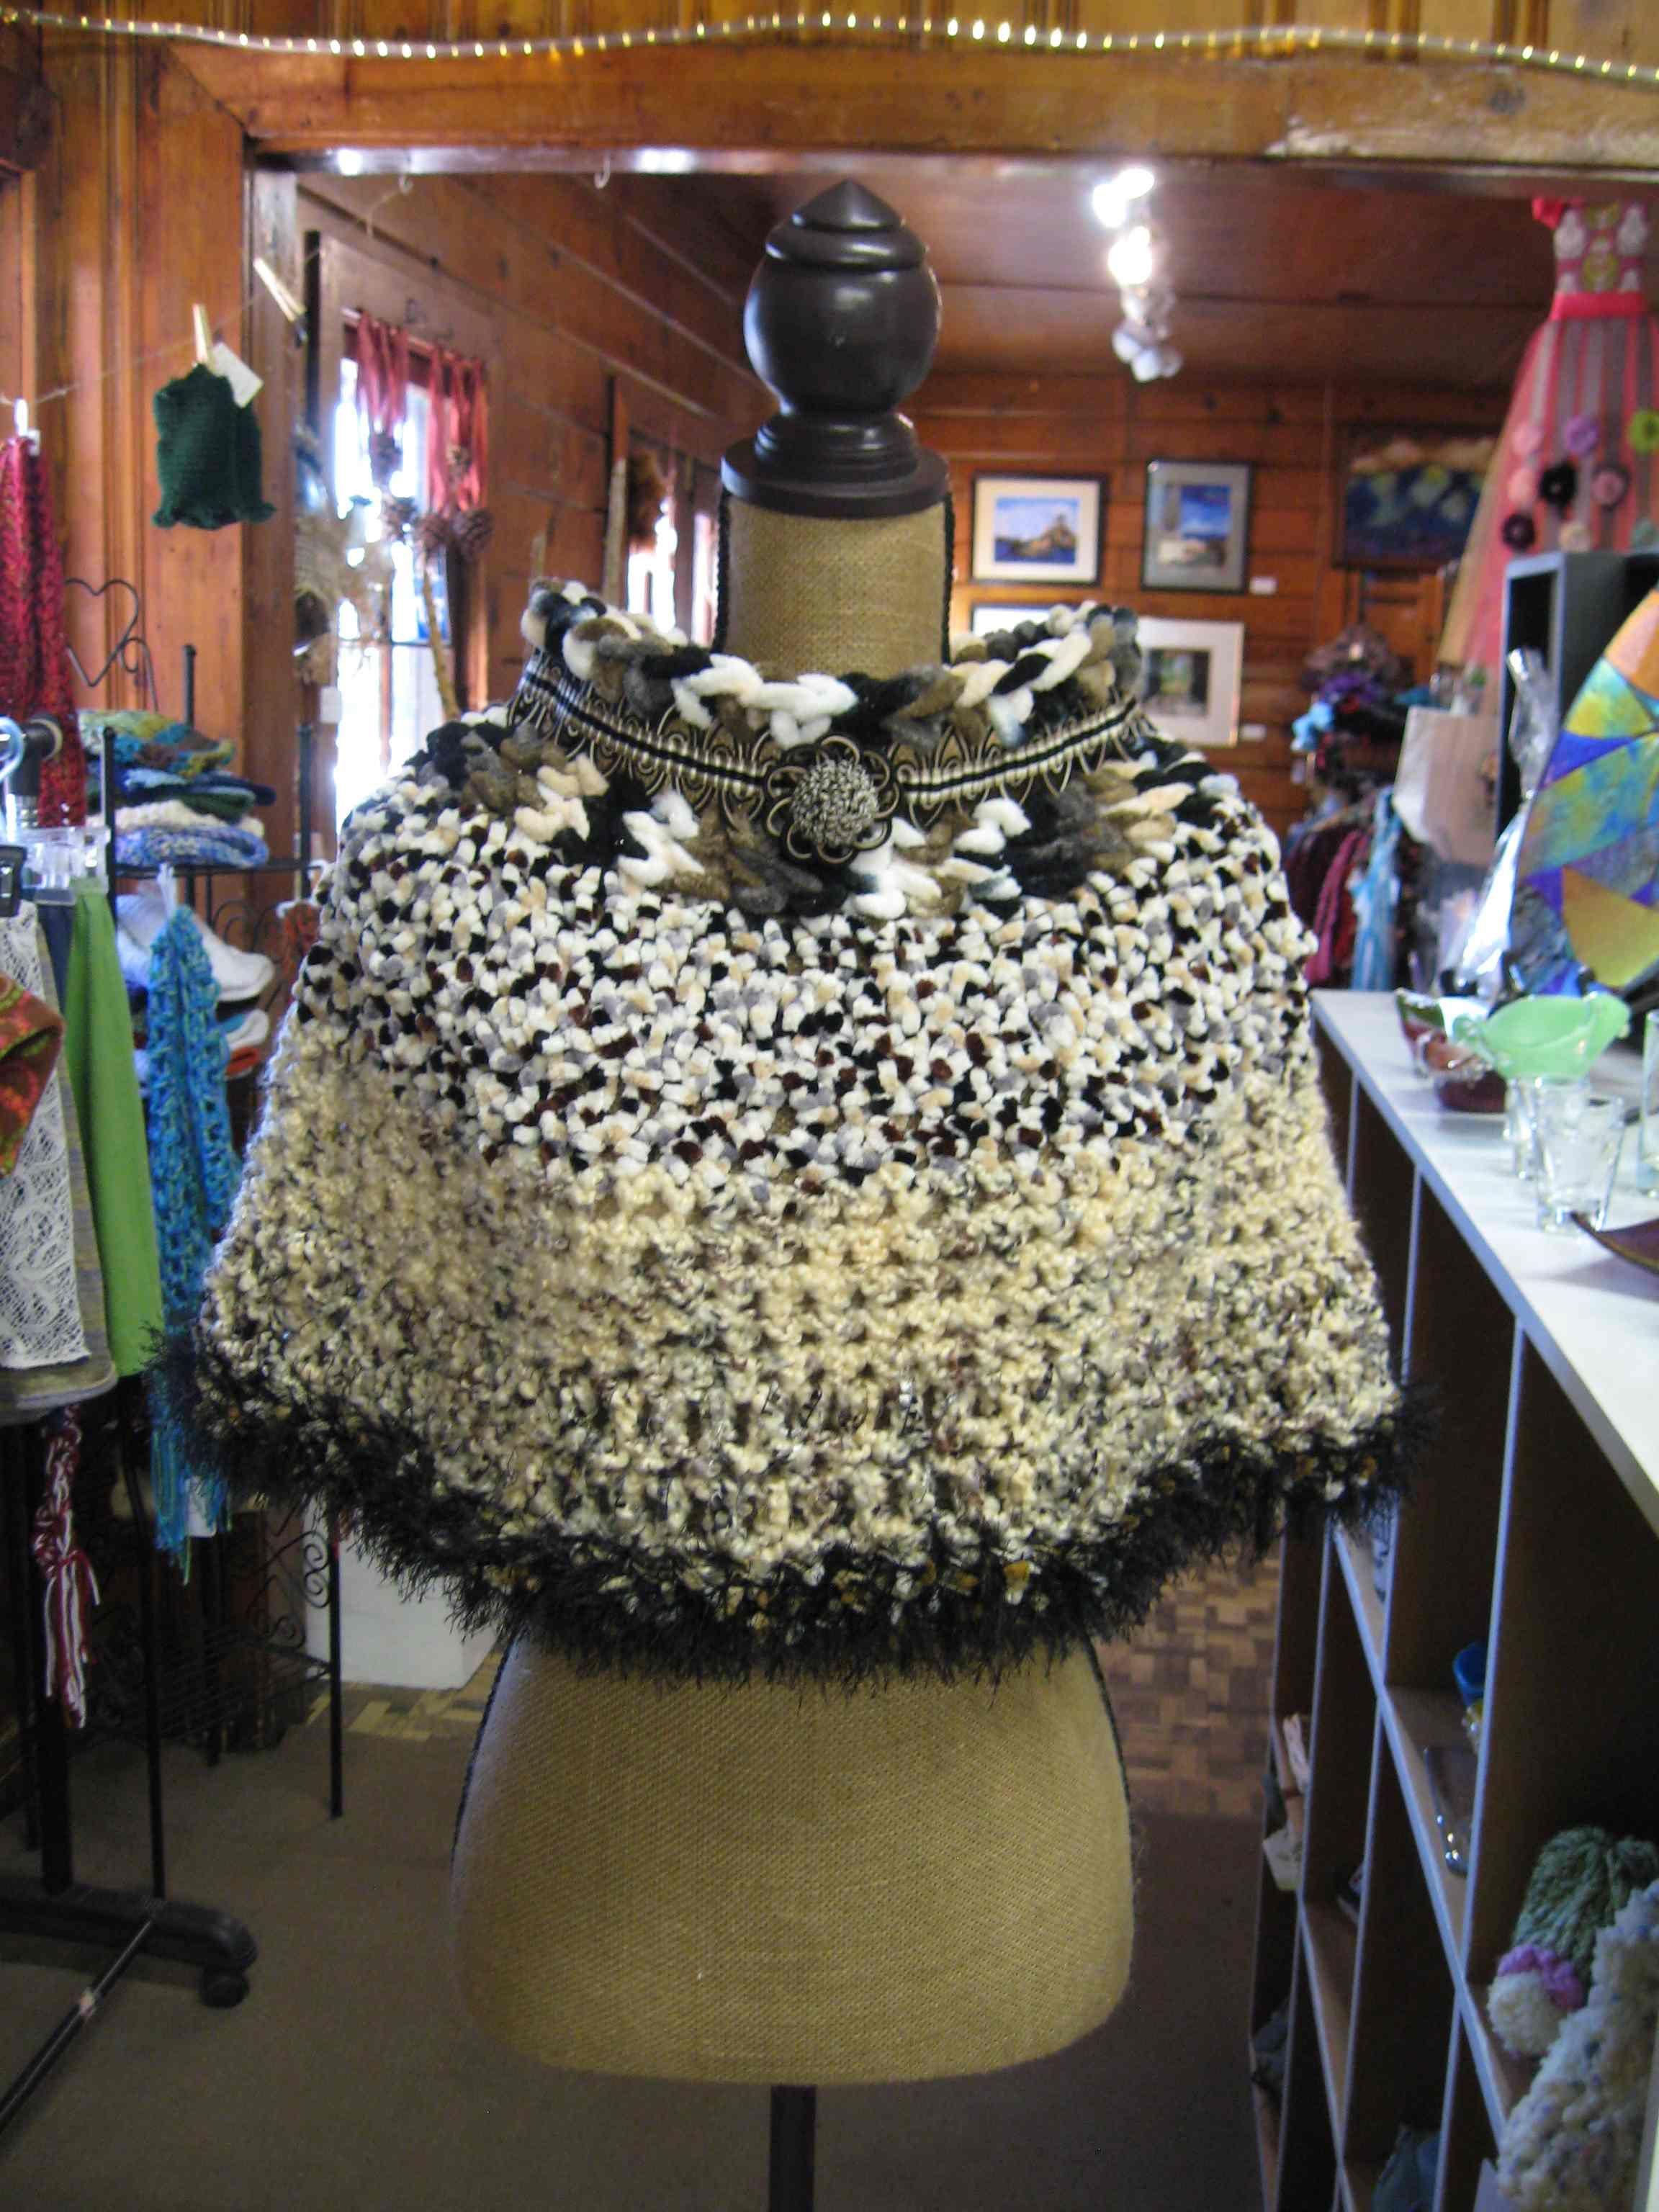 Chenille Poncho as seen on etsy $85https://www.etsy.com/listing/123423024/handmade-crochet-chenille-poncho?ref=pr_shop